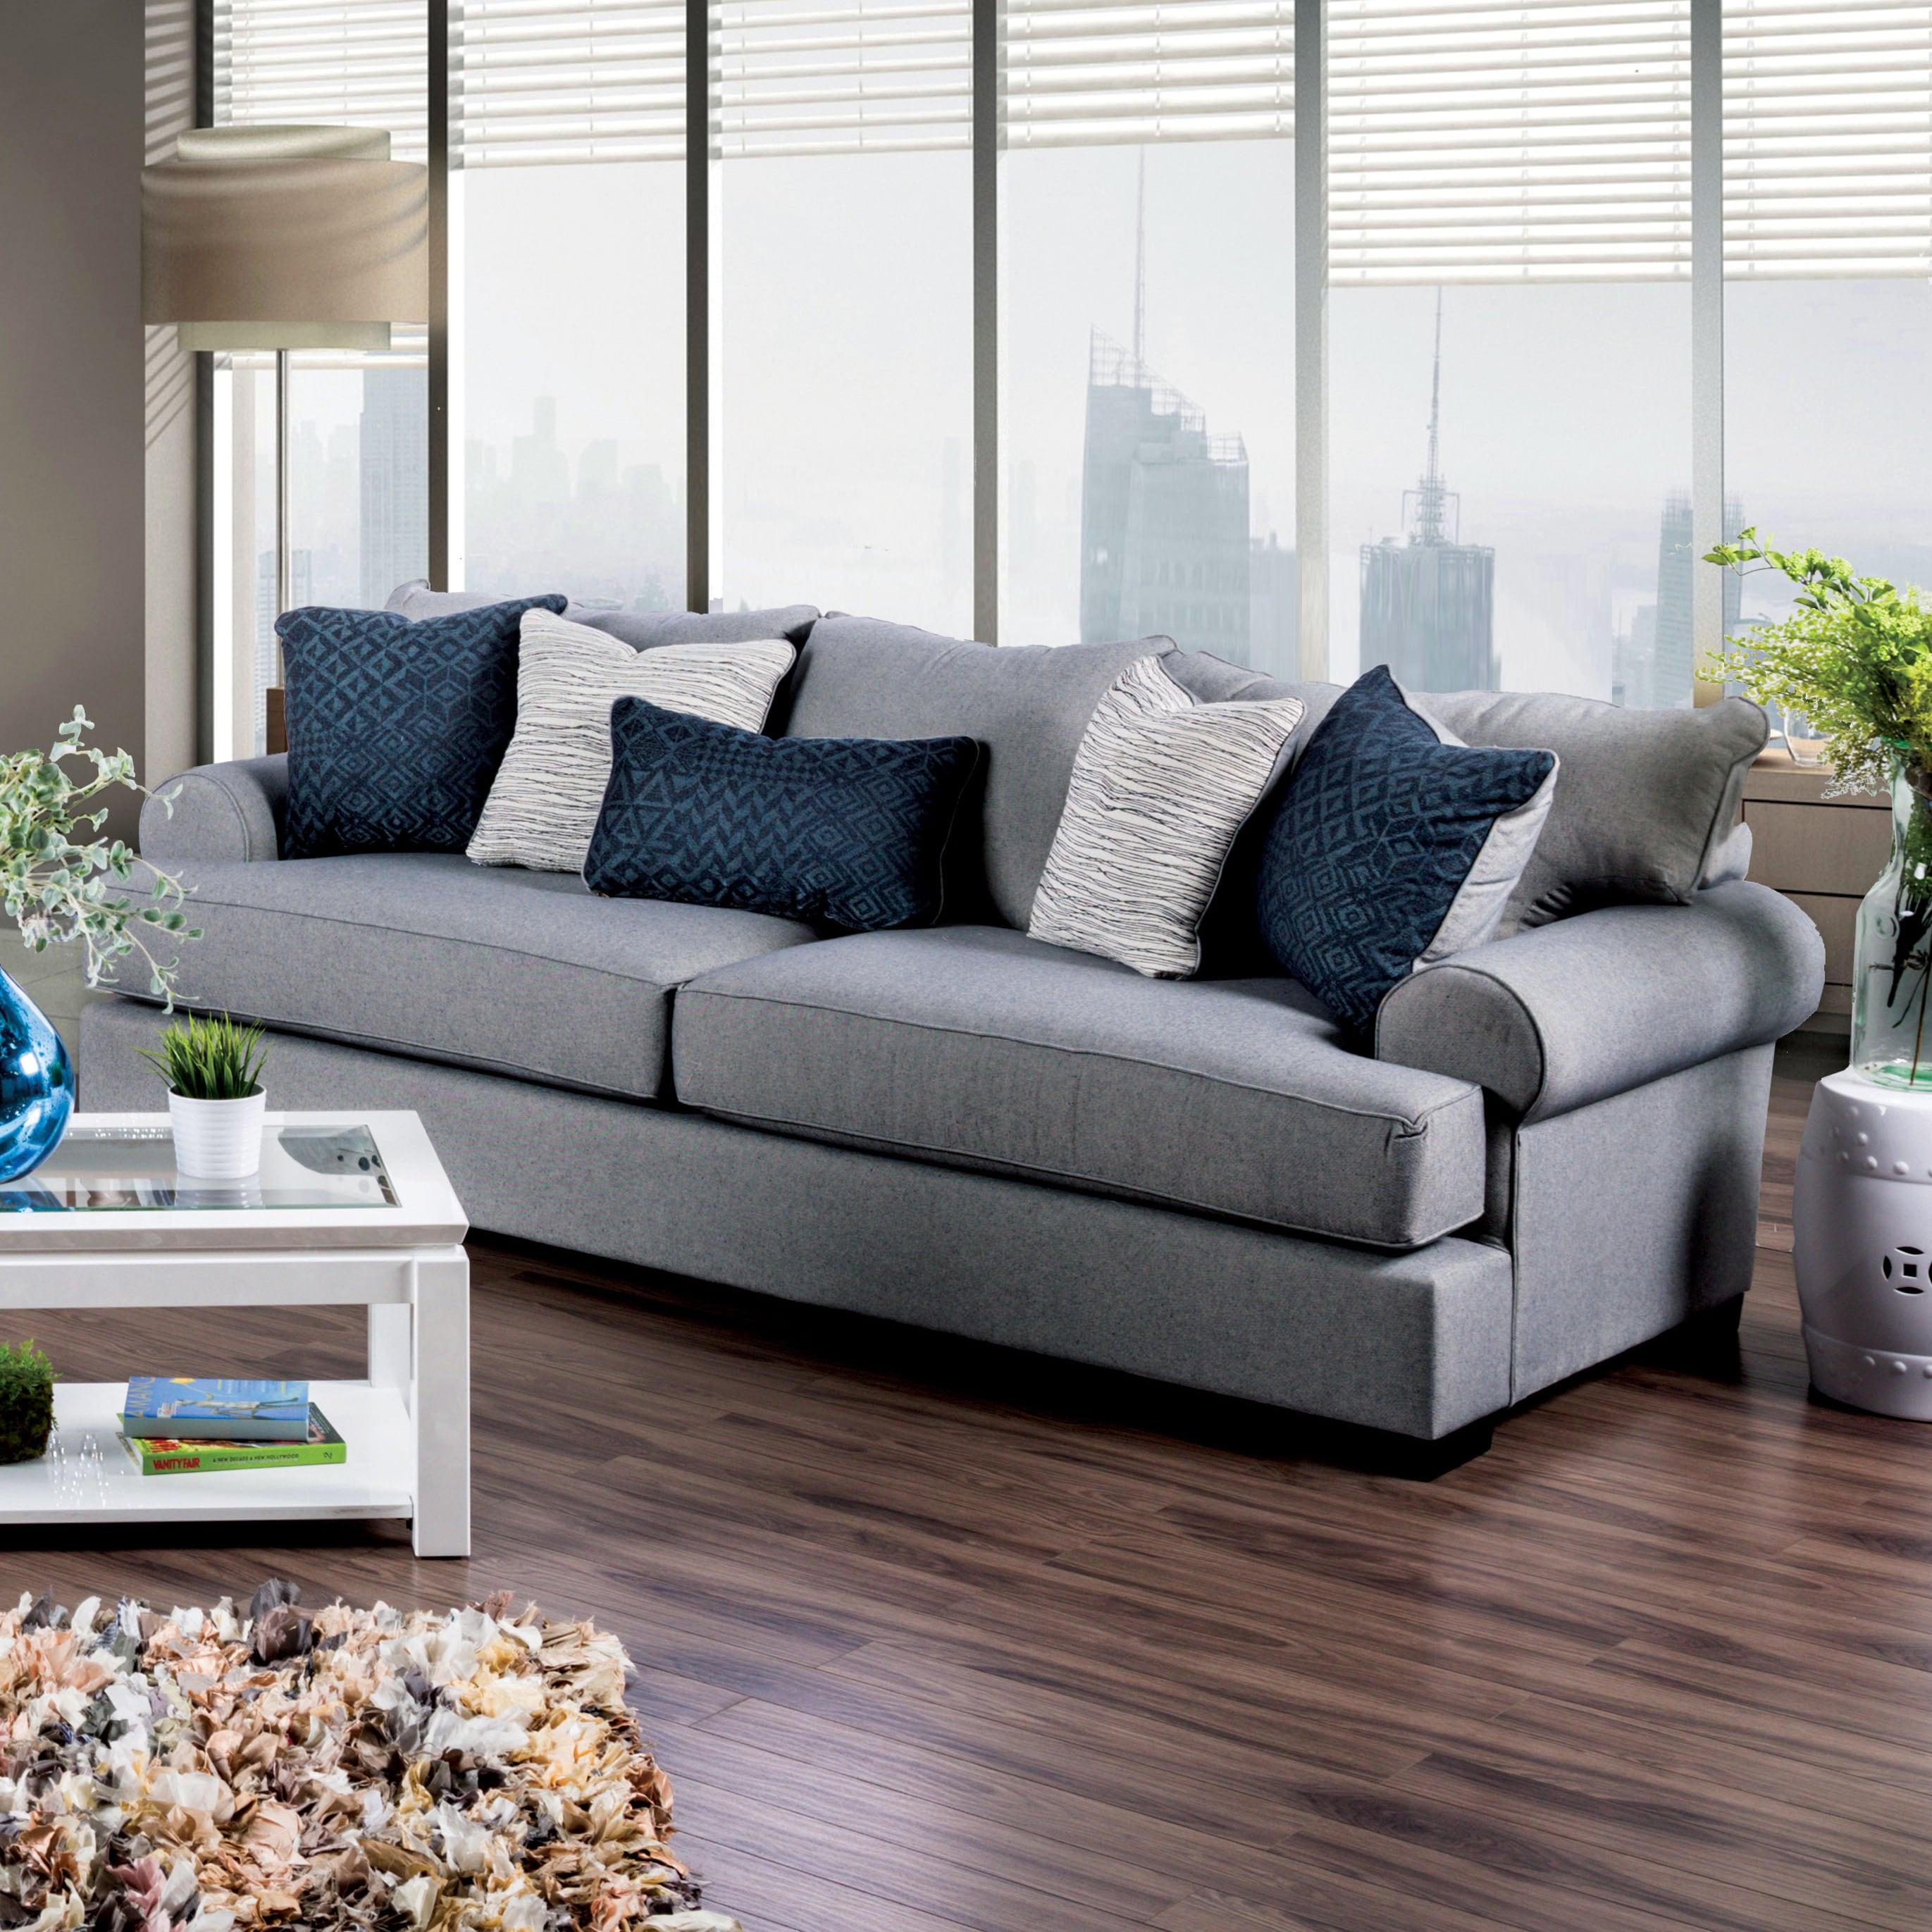 Furniture of America Renee Welt Trim Rolled Arm Premium F...